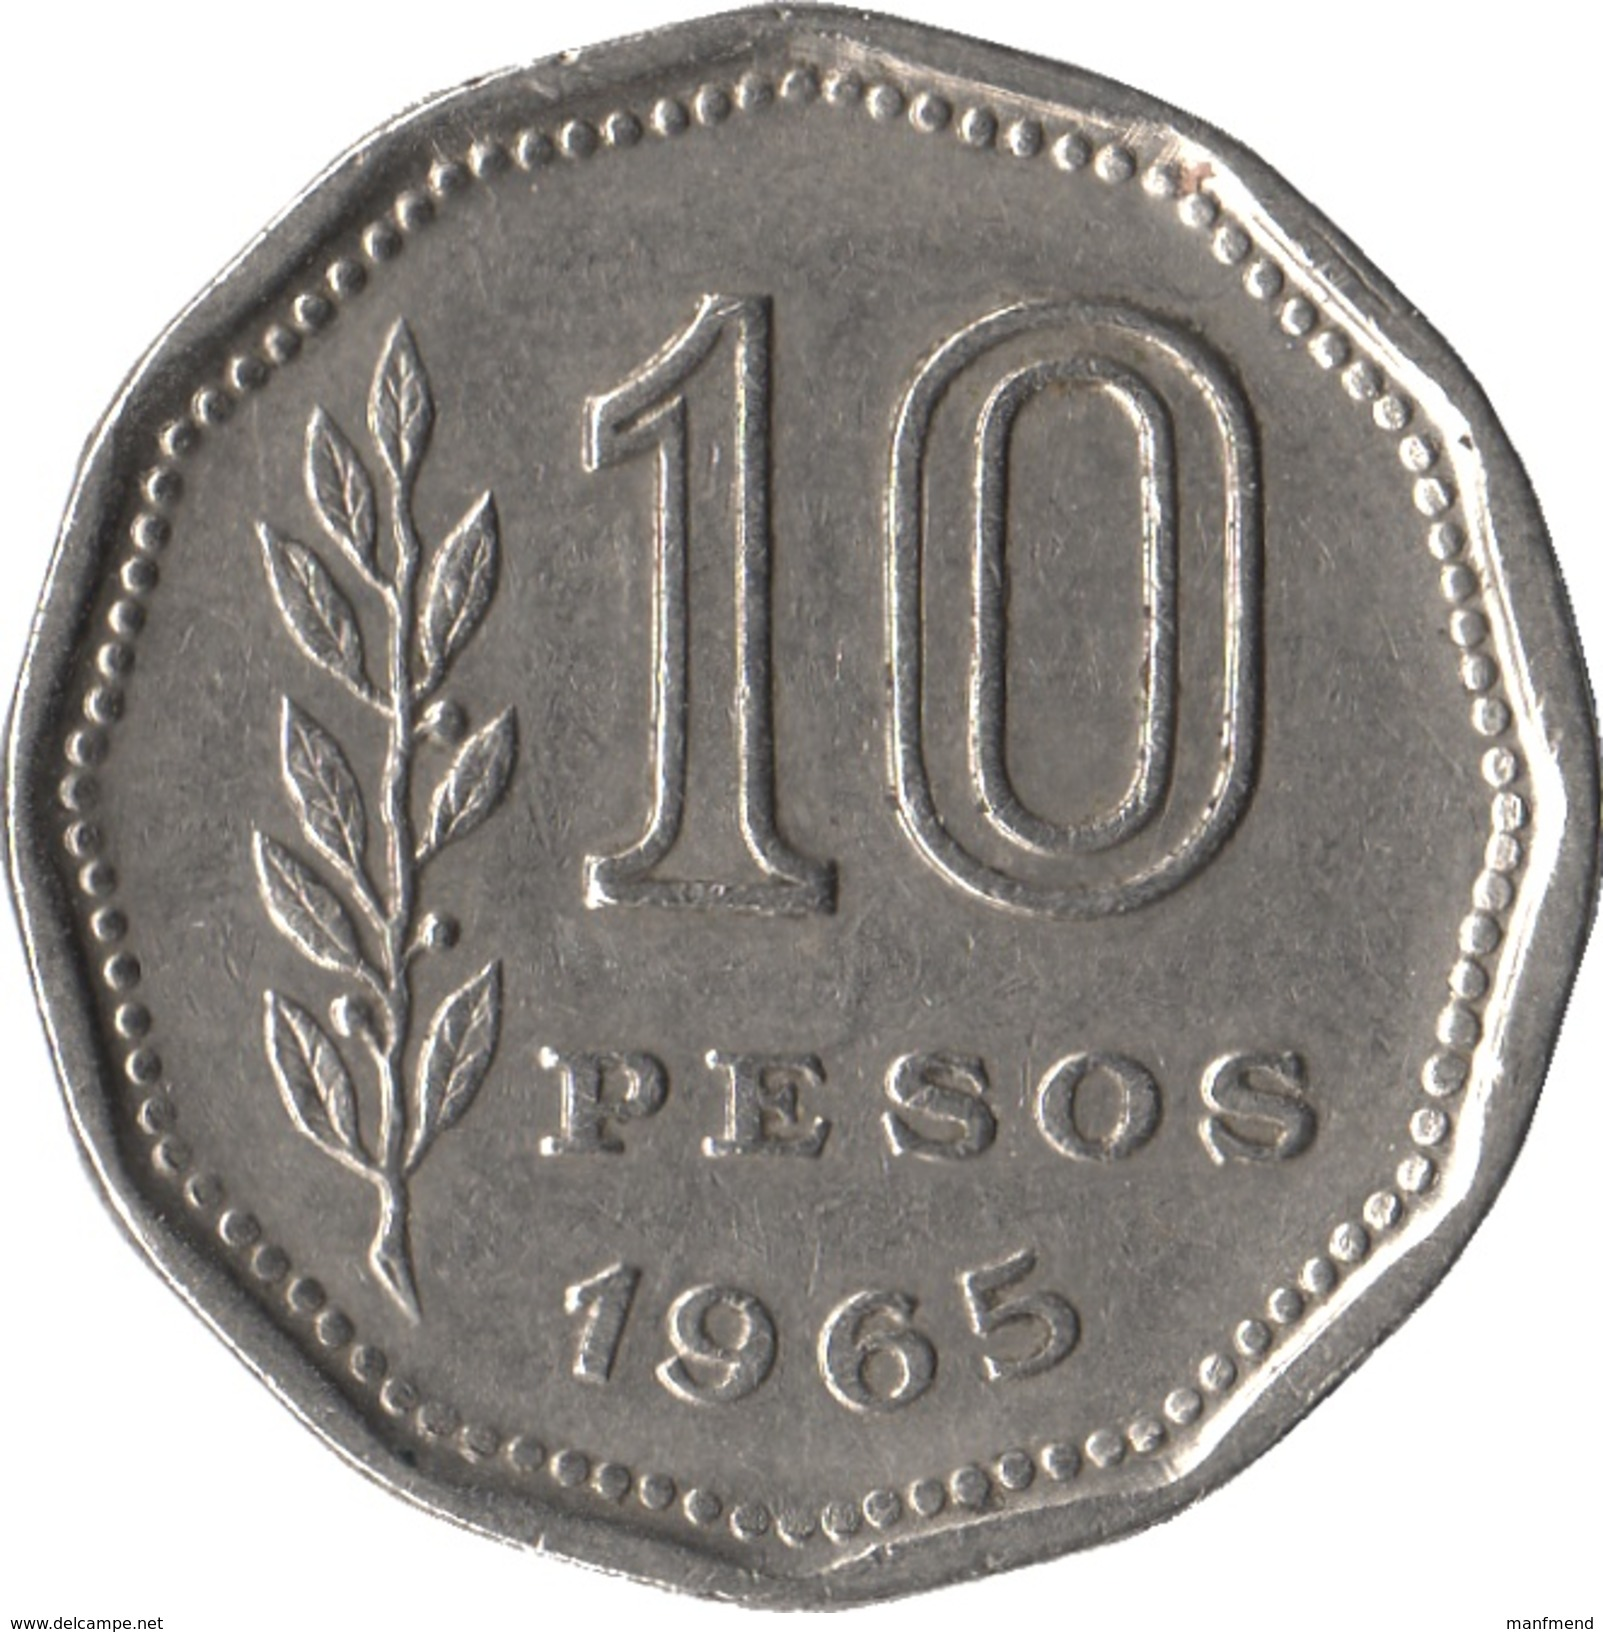 Argentina - 1965 - 10 Pesos - KM 60 - VF - Argentine